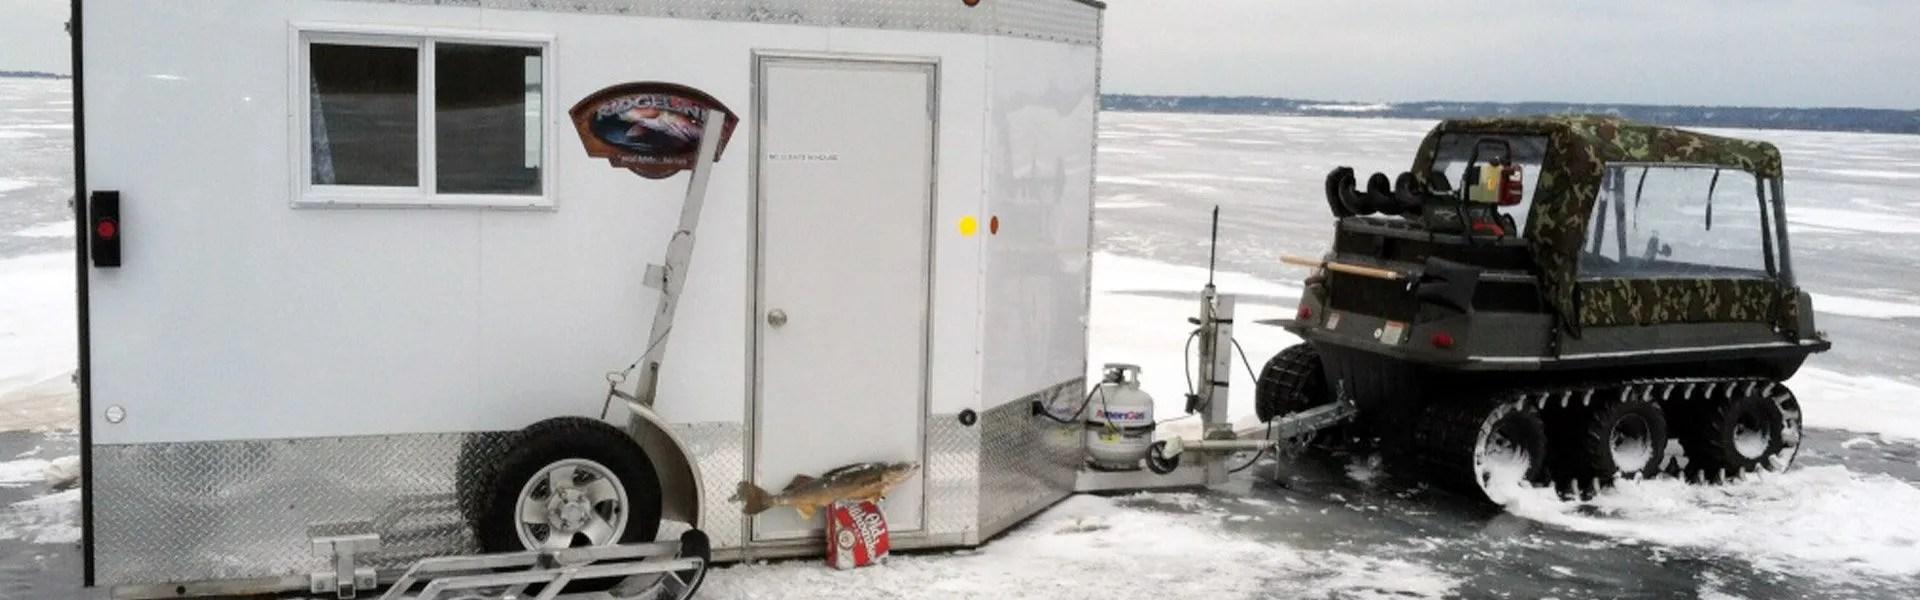 Fish Houses – Ridgeline Manufacturing – creating high ... on iceshanty sleds, ice sledding, homemade ice shanty sleds, antique ice sleds, ice fishing sleds,